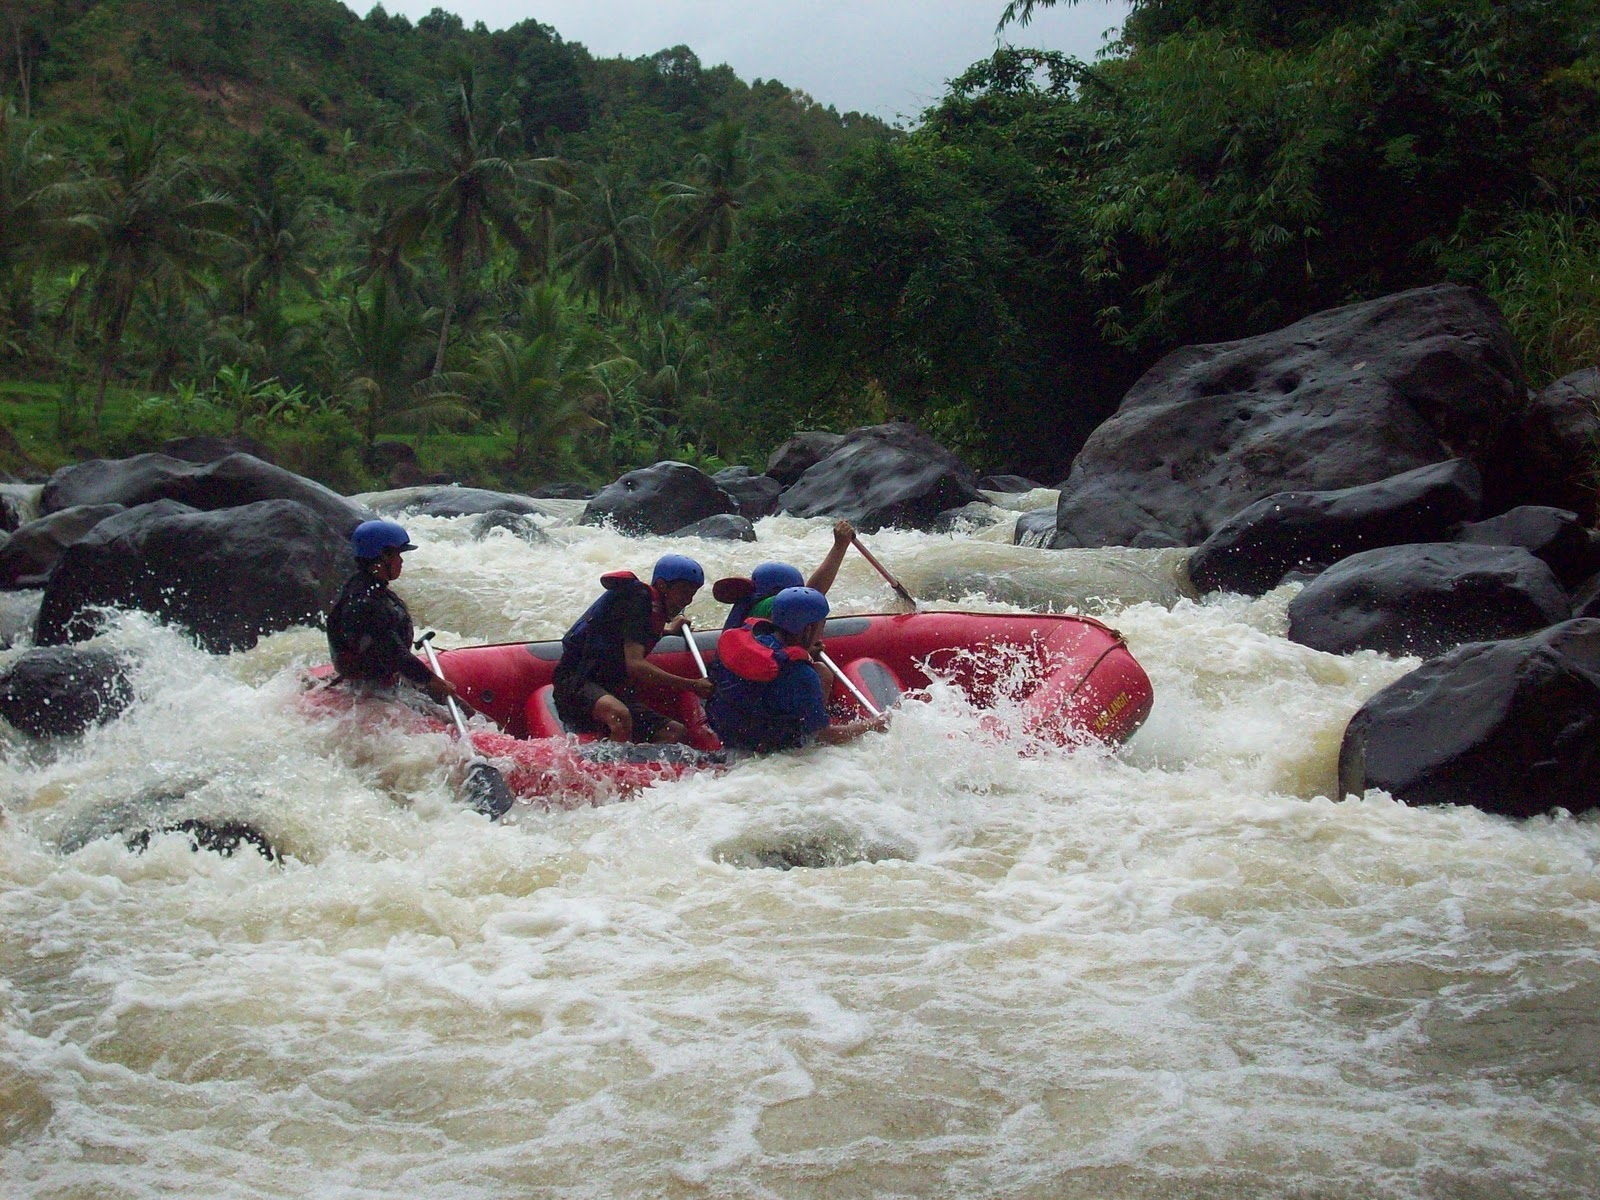 daya tarik Wisata Arung Jeram Sungai Cikundul